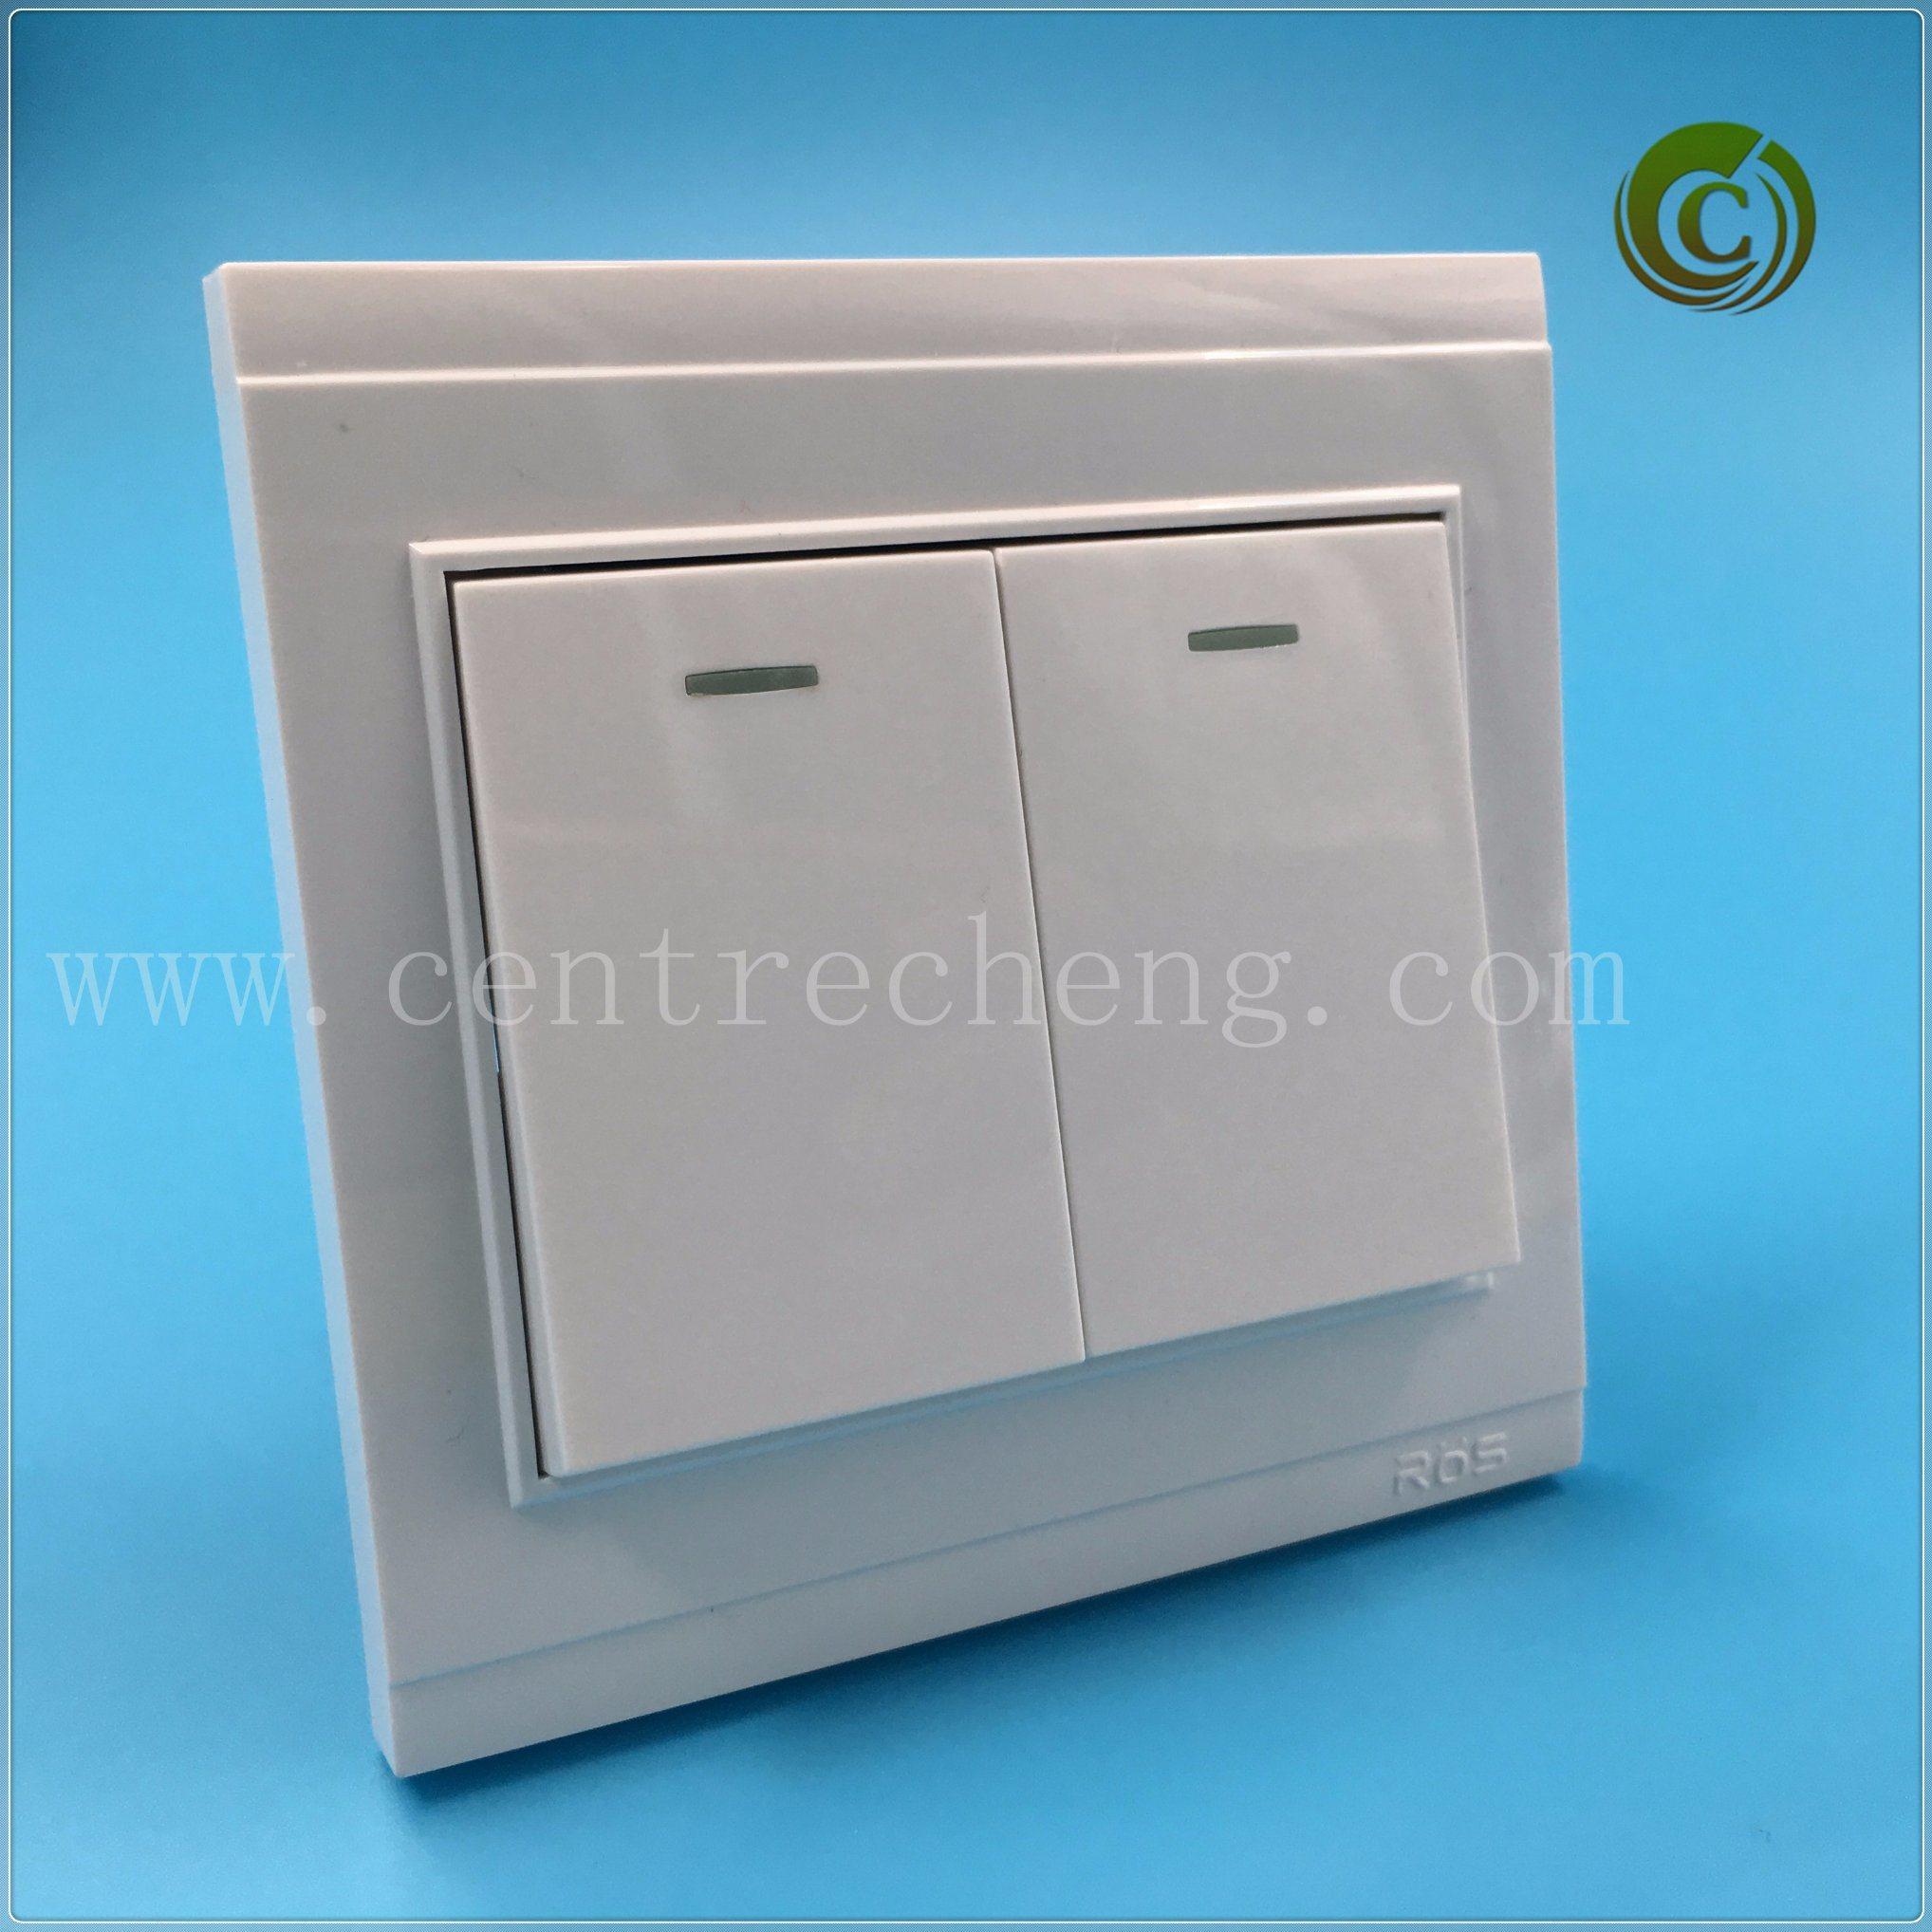 China 2018 Foshan 2 Gang 2 Way Big Plate Switch Electrical Switch ...